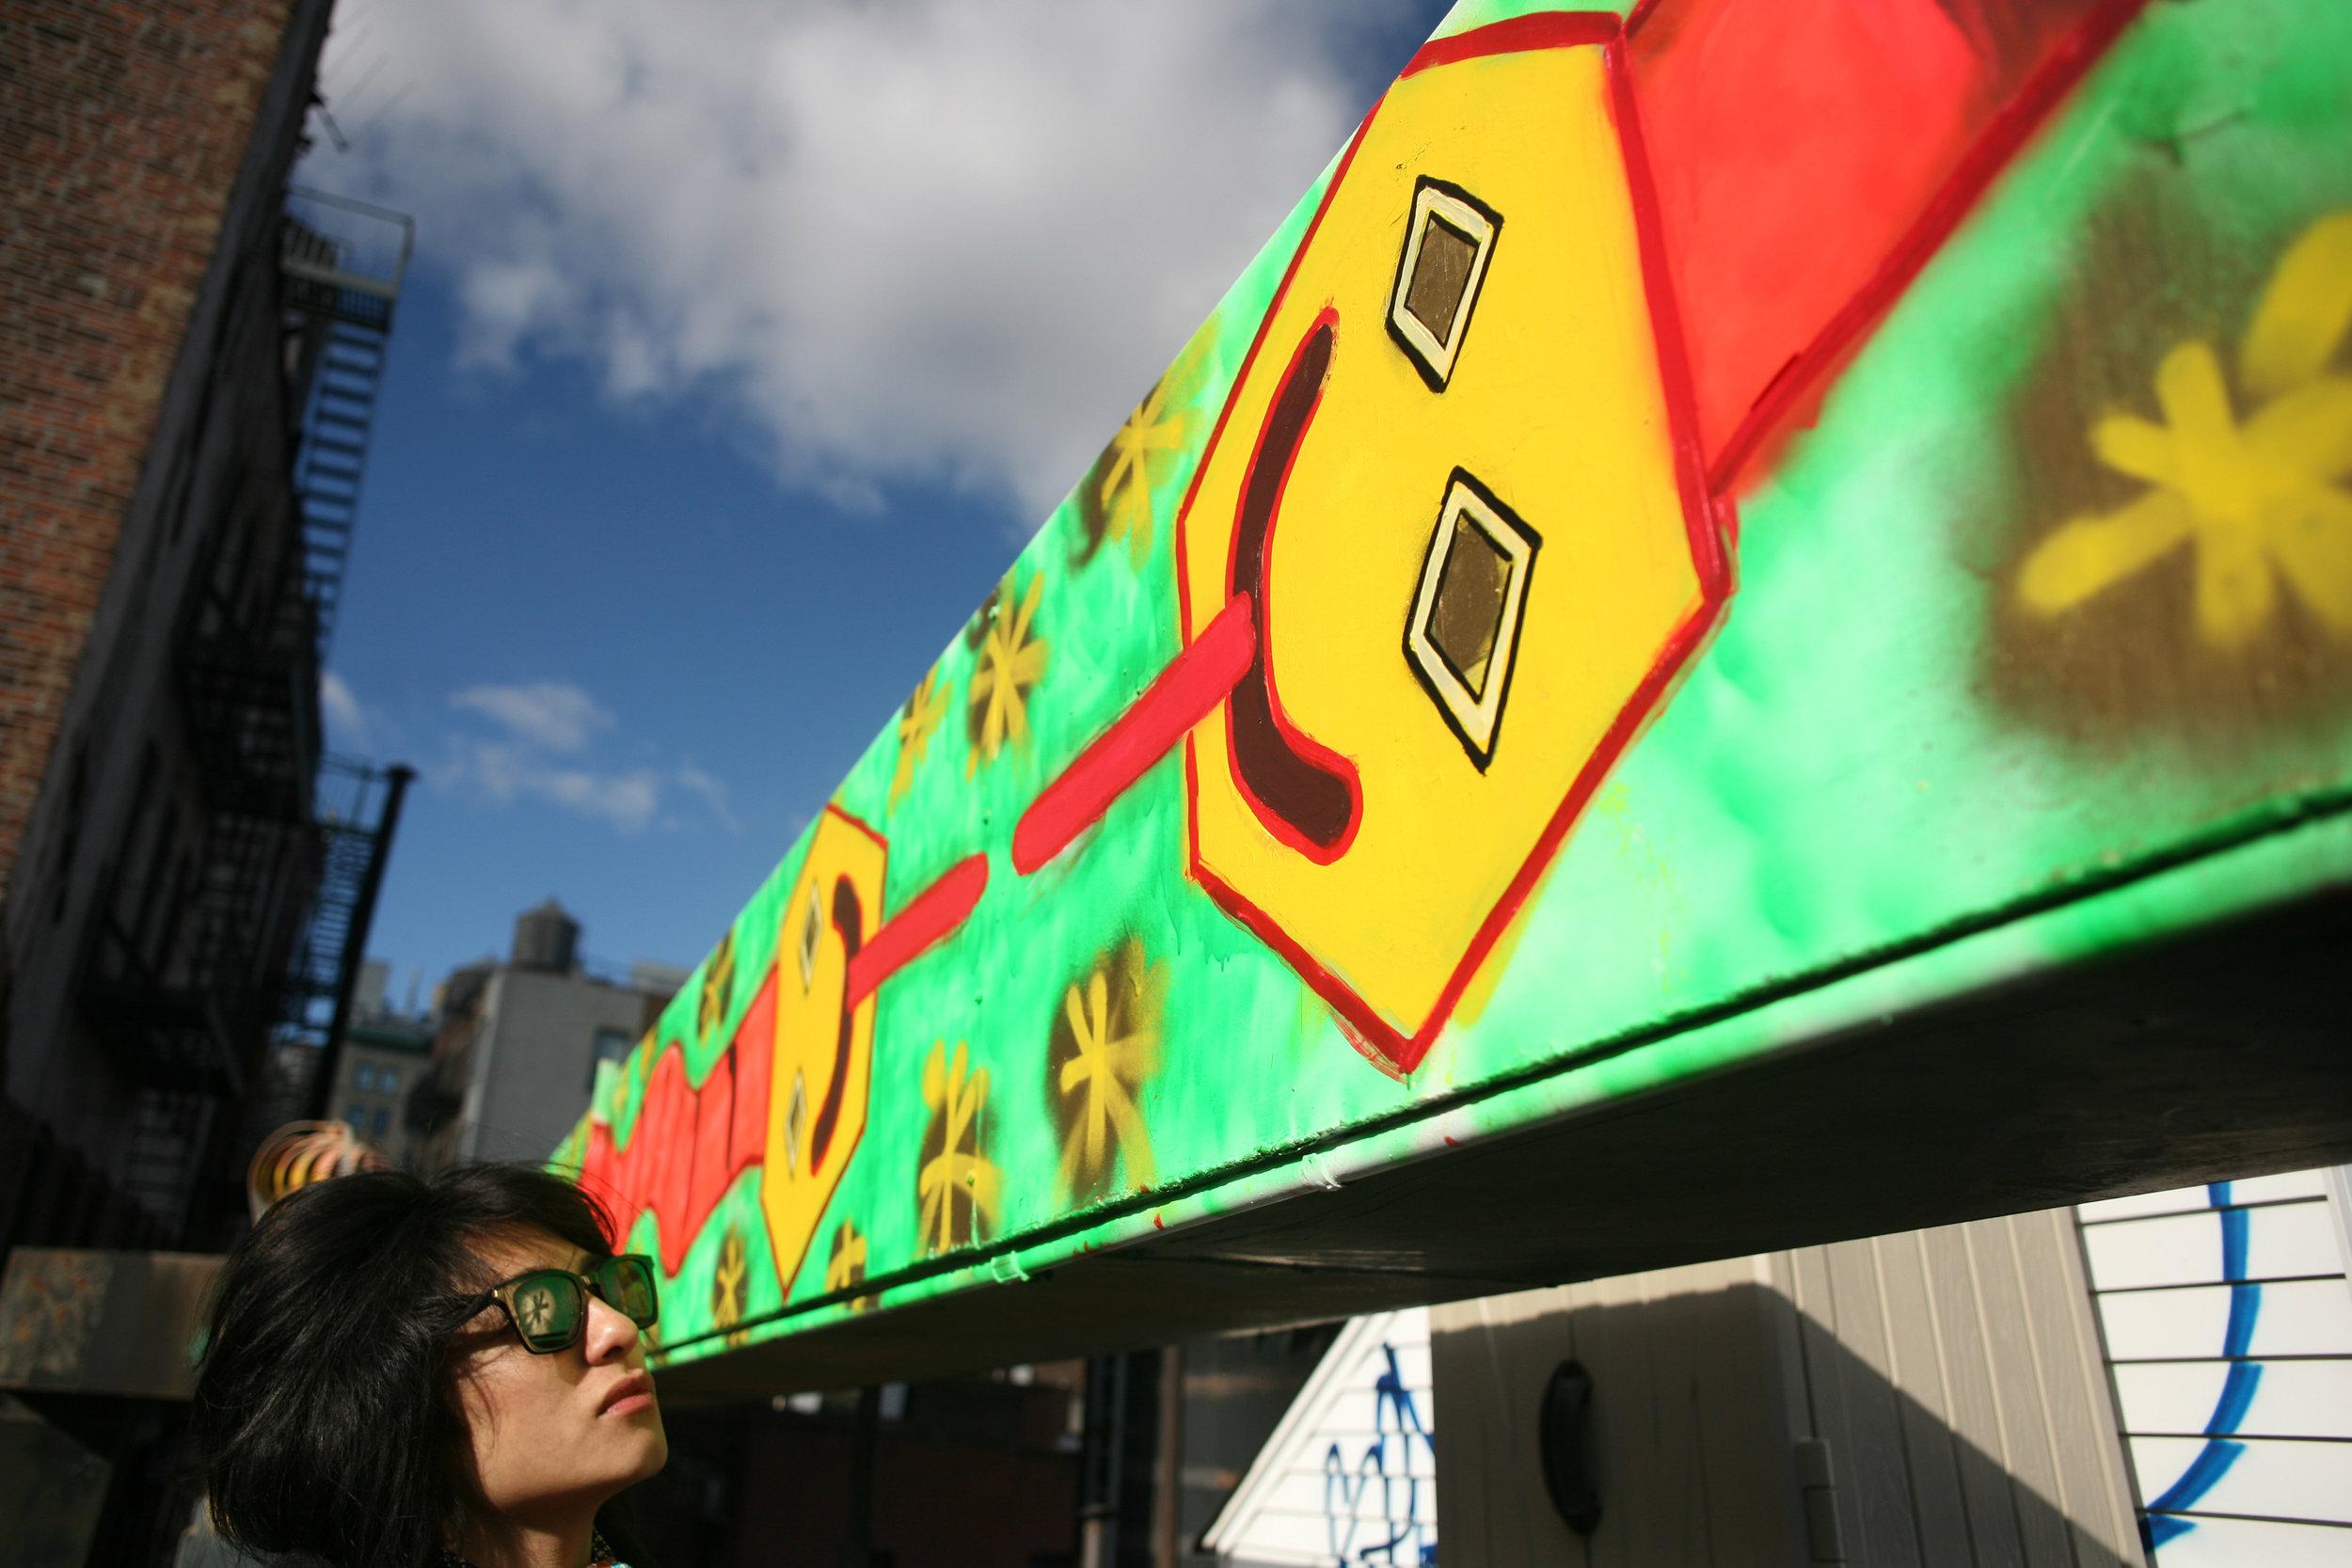 Cecilia-collantes-streetart-kulebra2.jpg